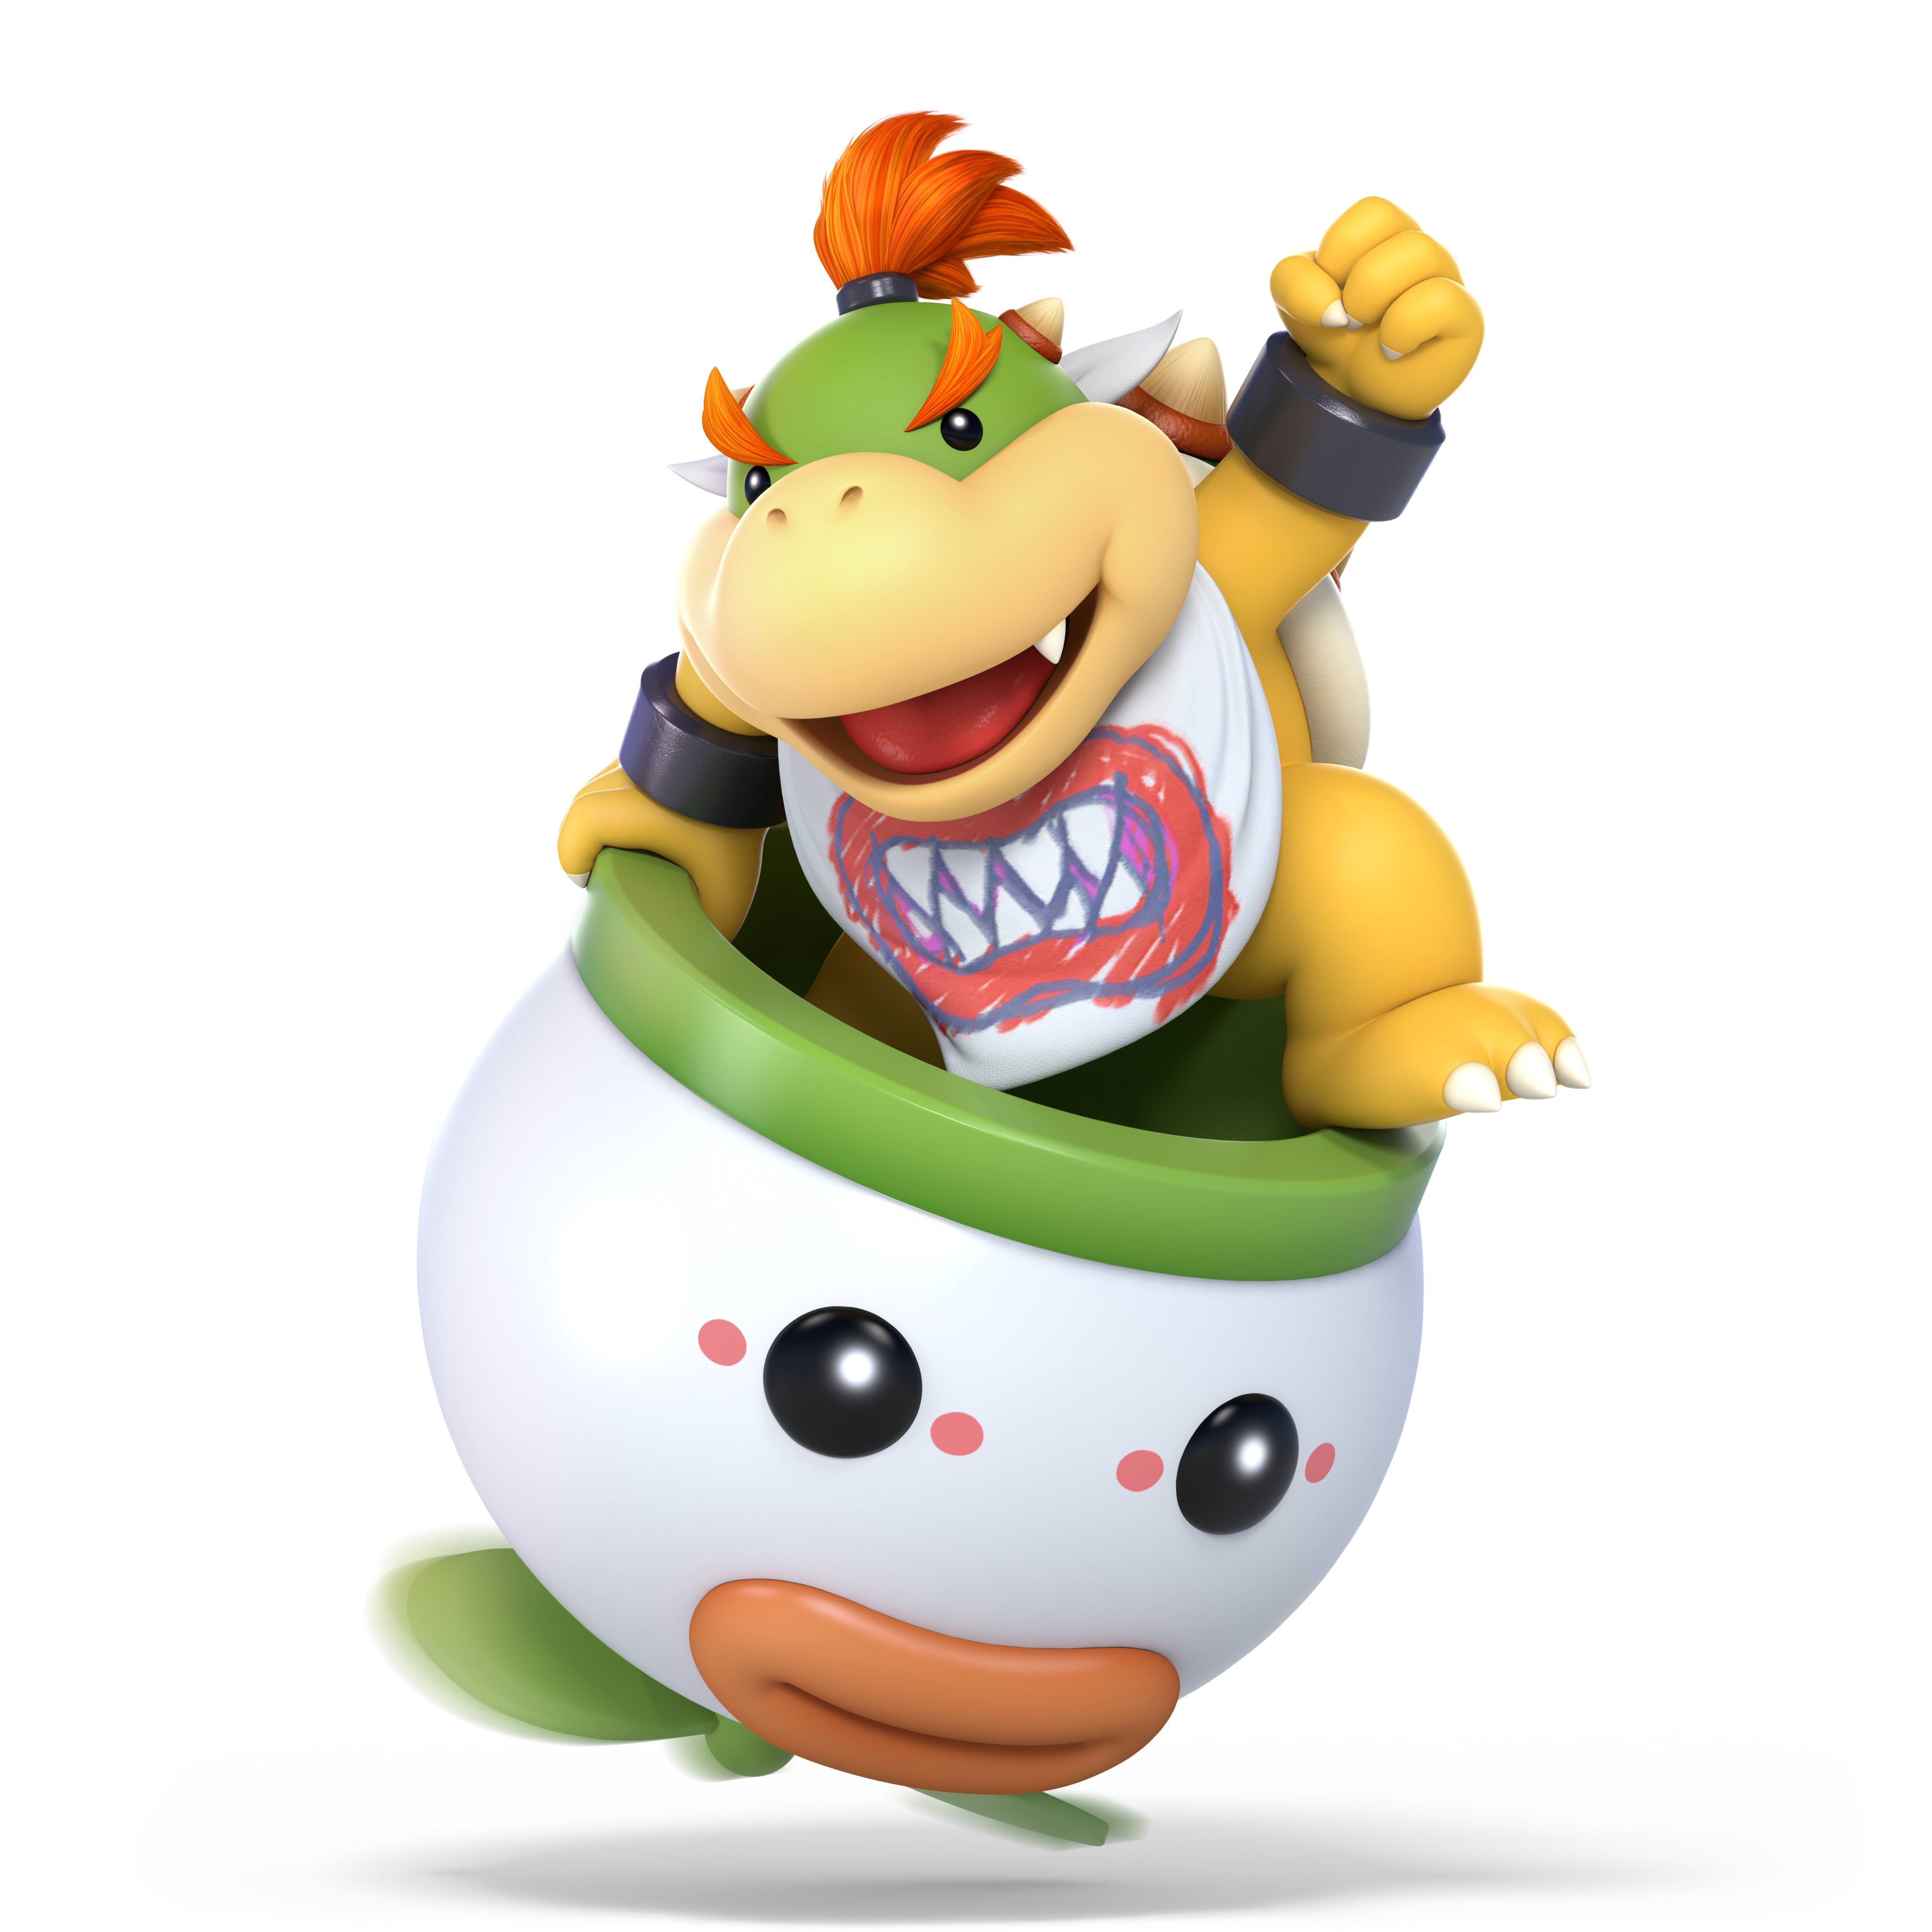 Super Smash Bros Ultimate How To Unlock Bowser Jr.